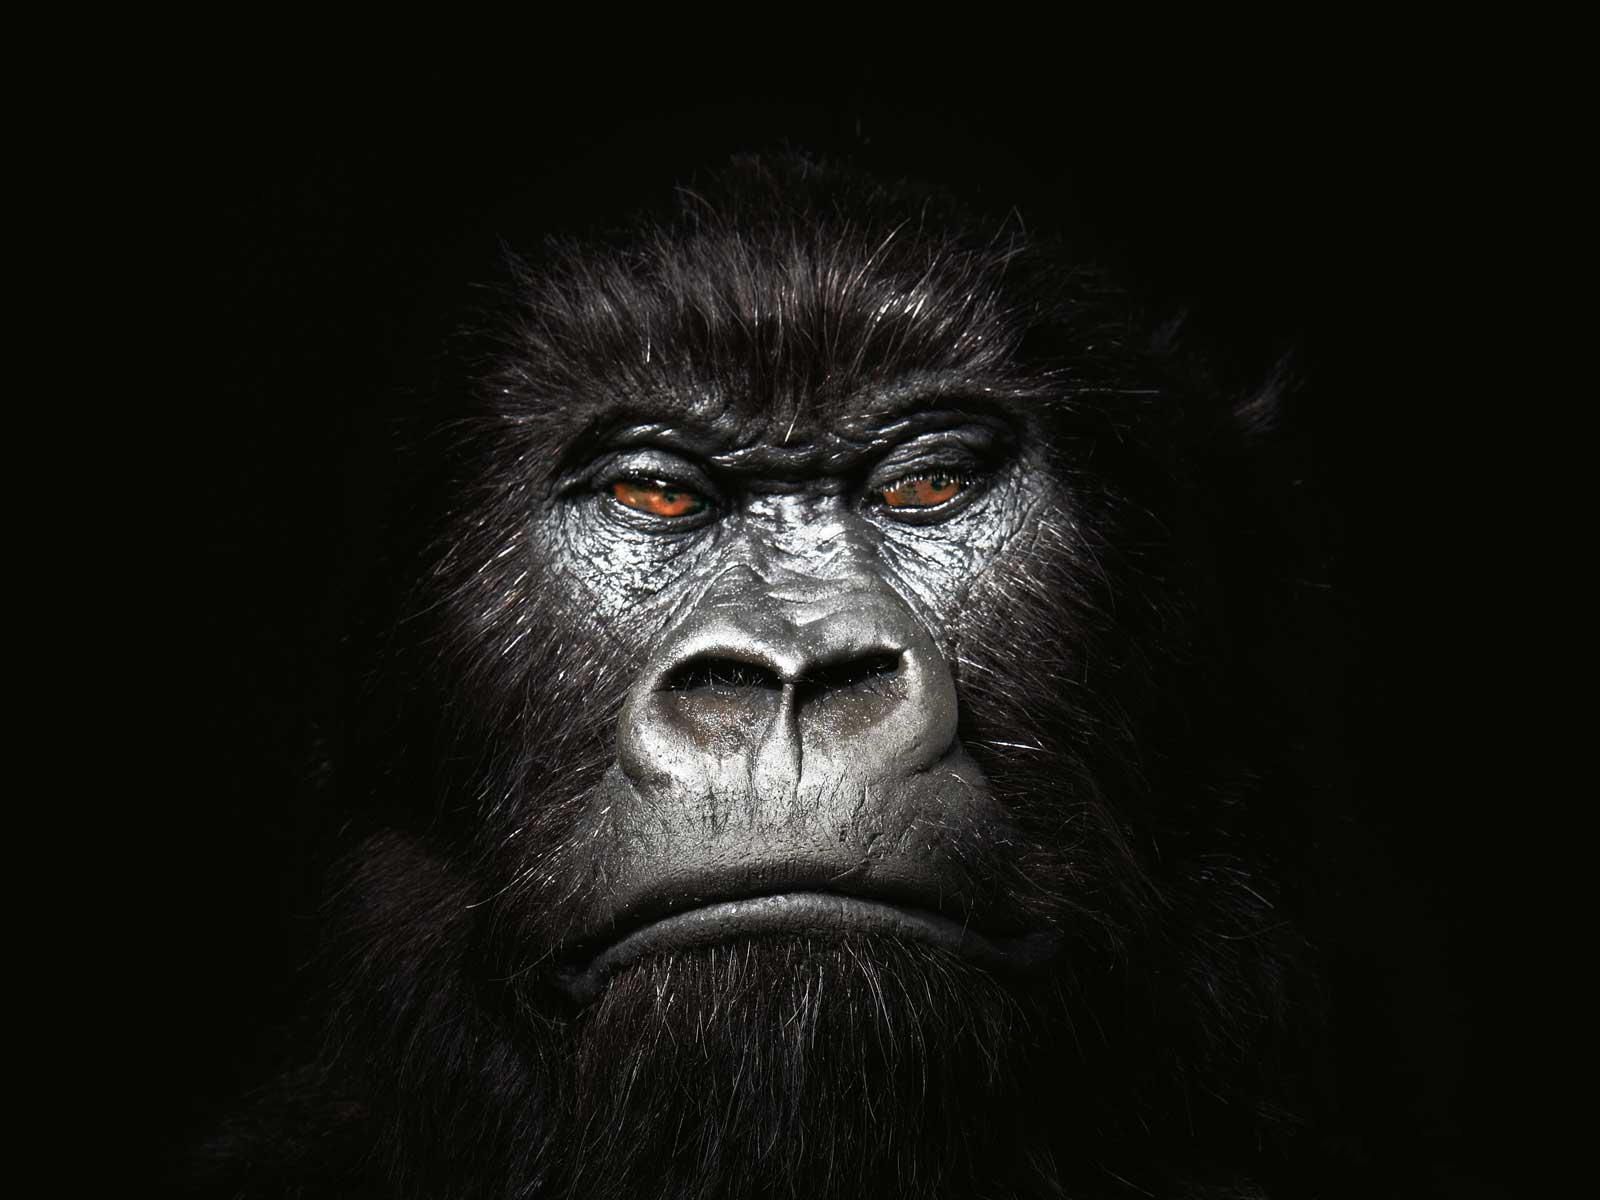 Gorilla Wallpapers   Funny Animals 1600x1200